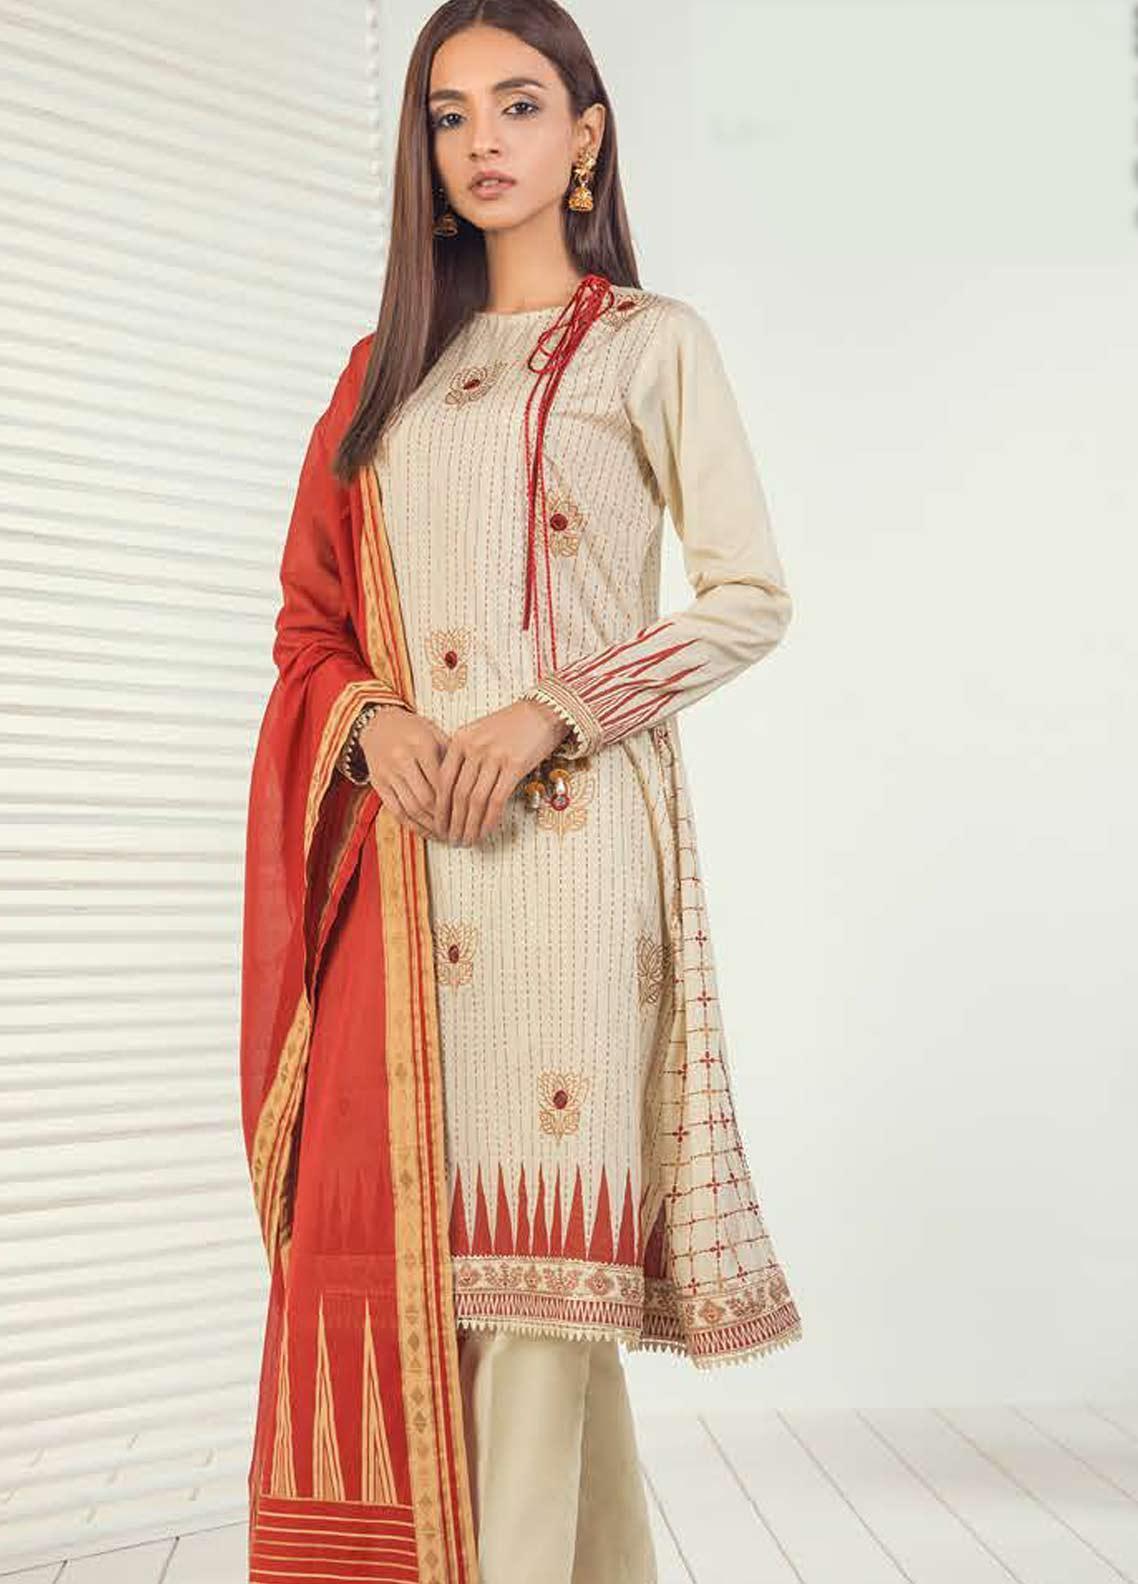 Orient Textile Embroidered Lawn Unstitched 3 Piece Suit OT19-L3 190B - Mid Summer Collection